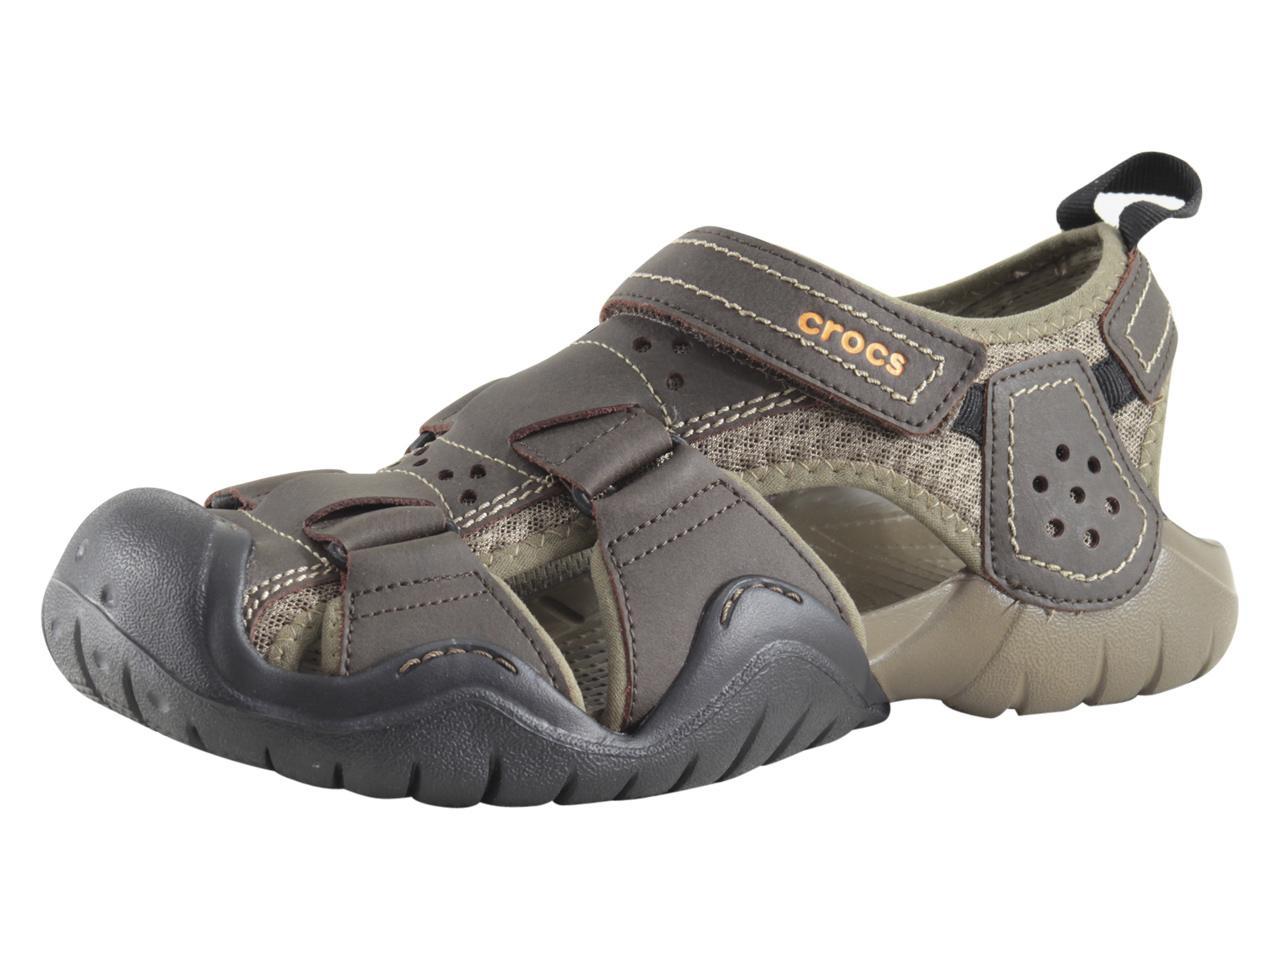 72440867c0c05 period limited time sale mens sandals yukon sports sandals yukon ...